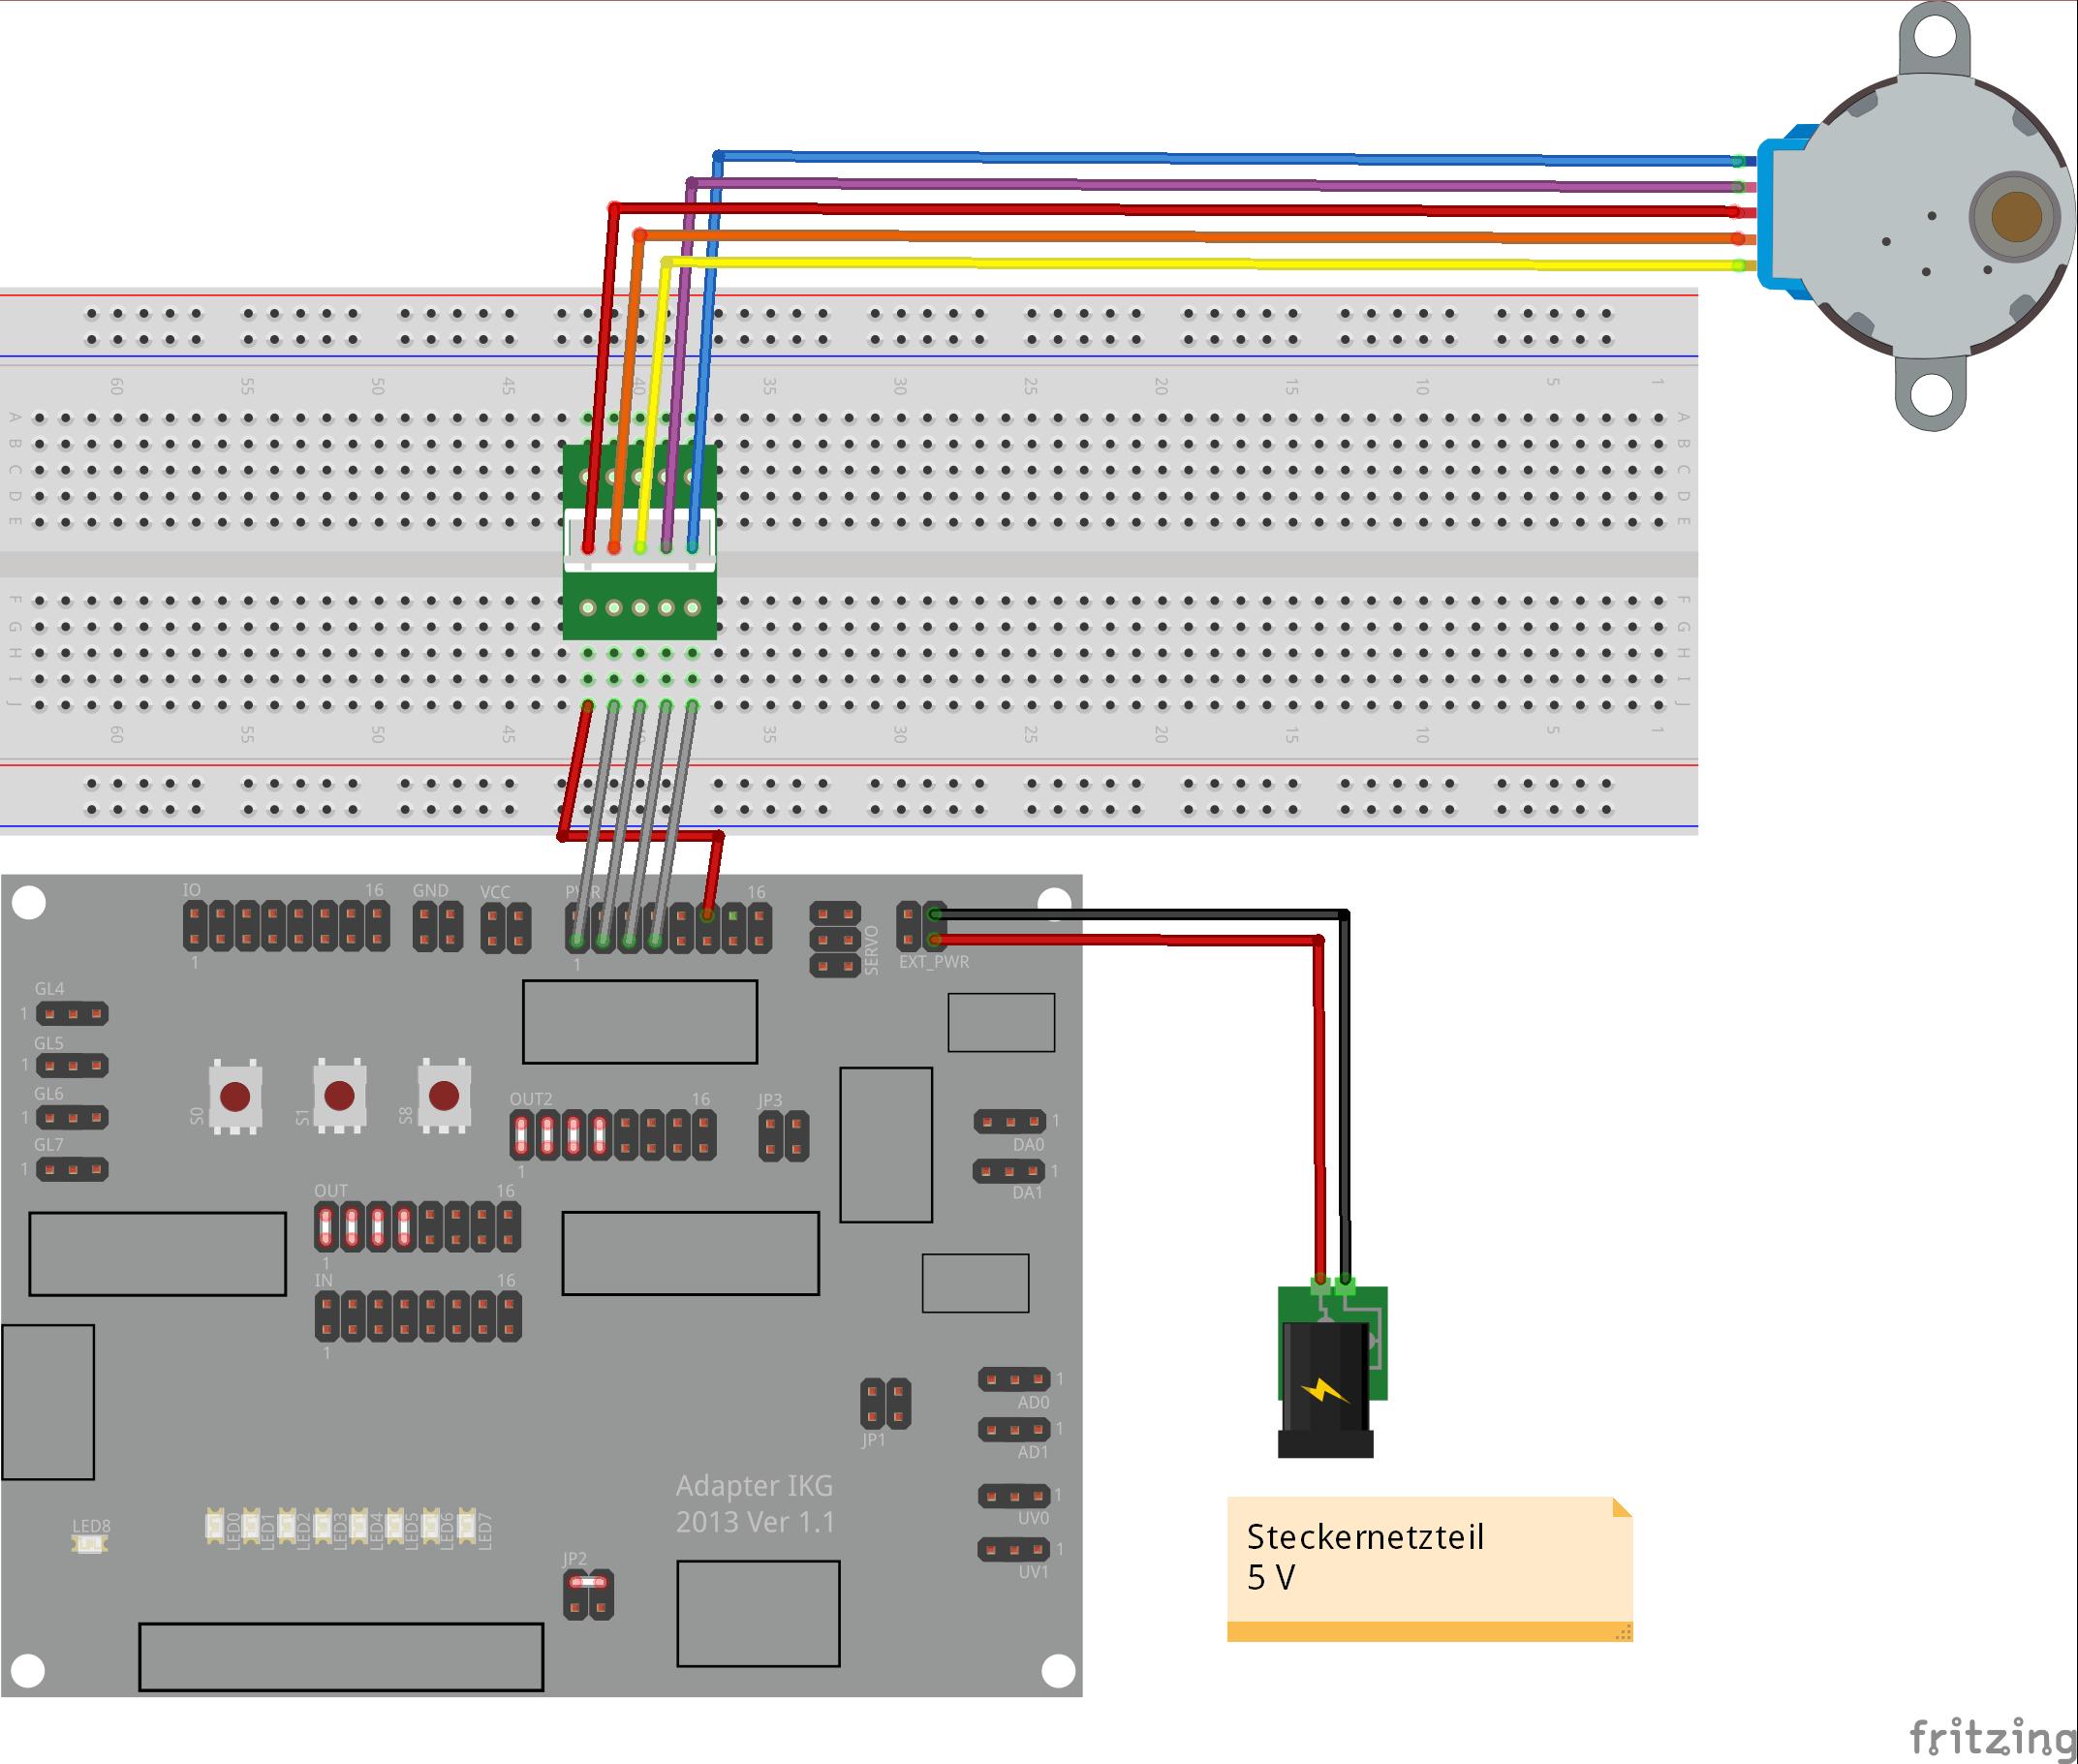 Adapterplatine IKG